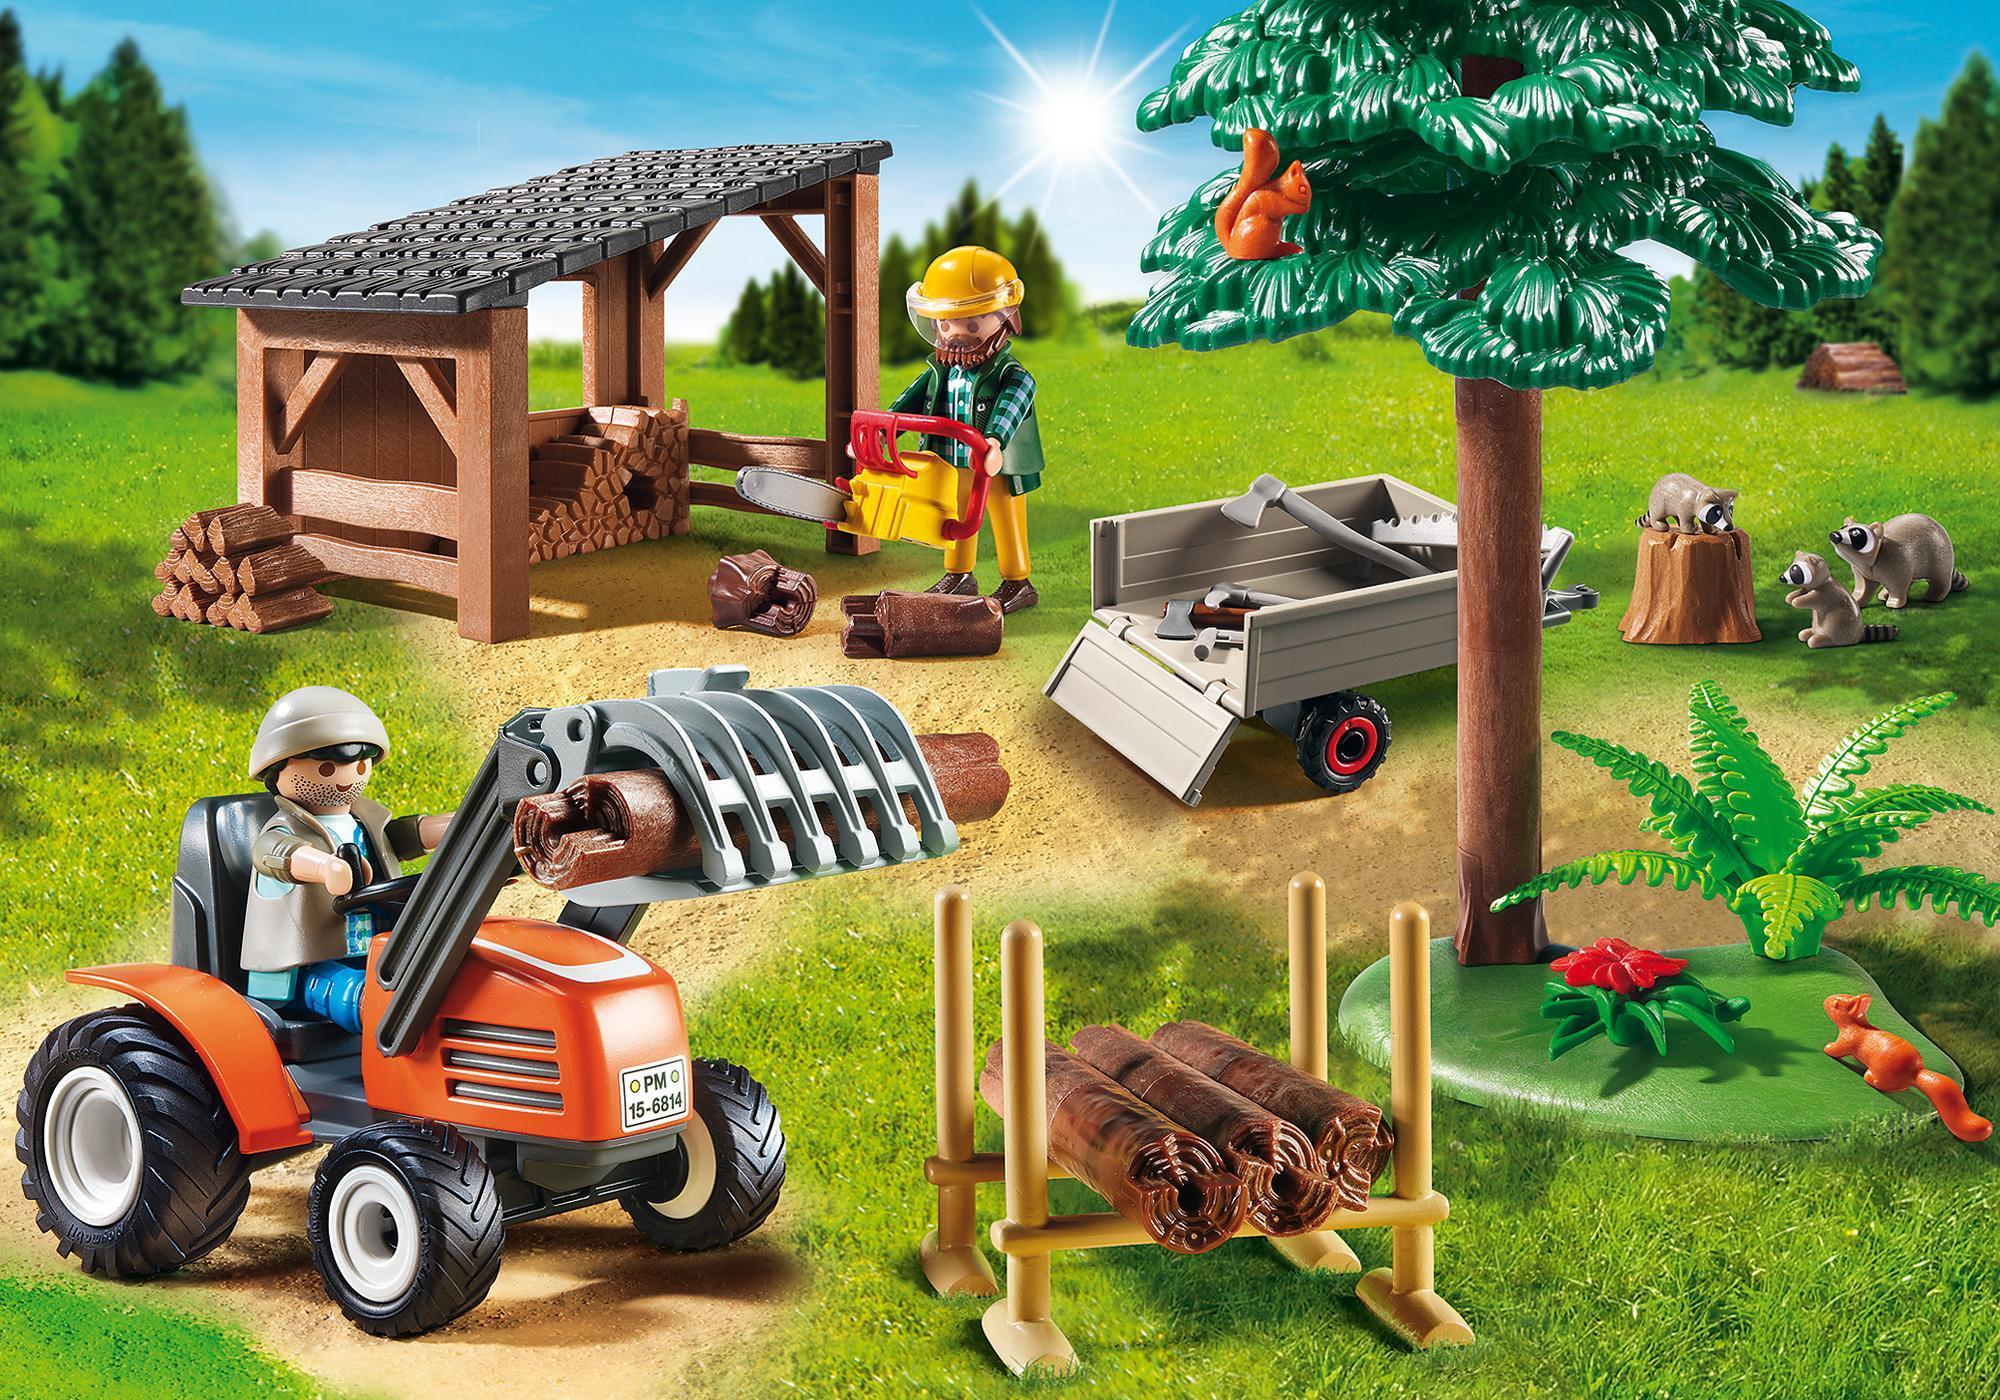 http://media.playmobil.com/i/playmobil/6814_product_detail/Houthakker met tractor